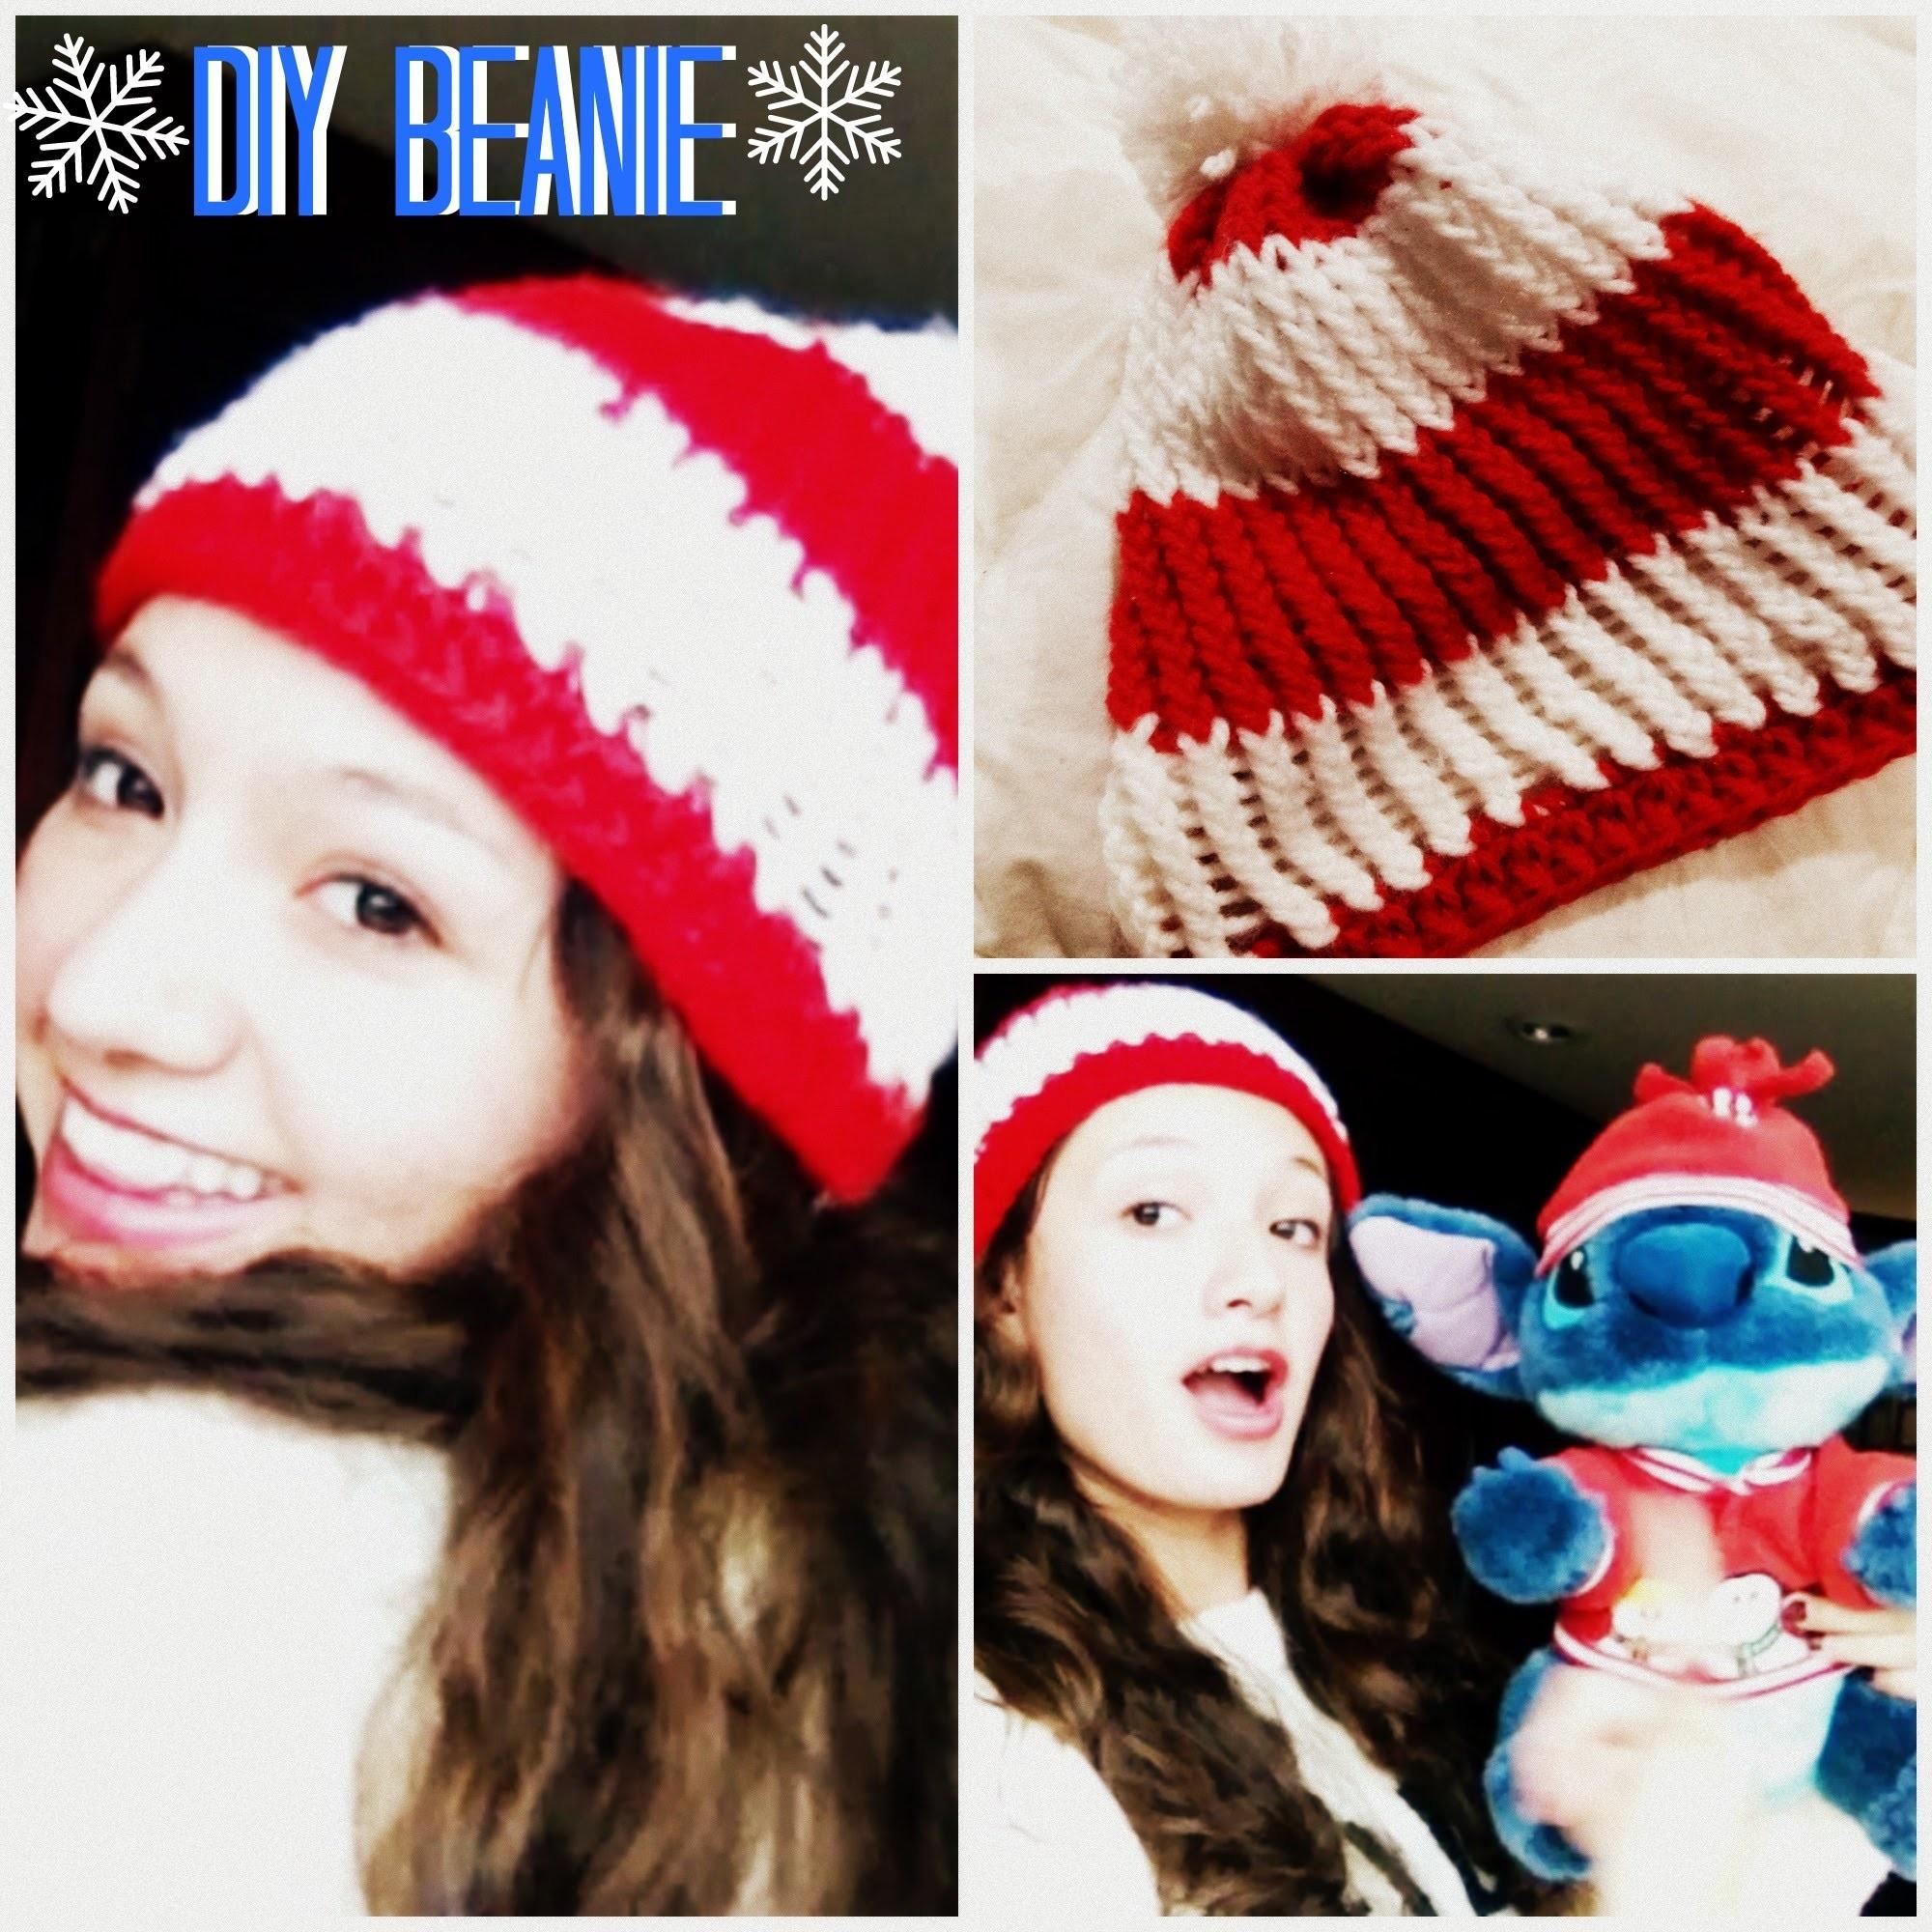 DIY Beanie! Navidad 2014!